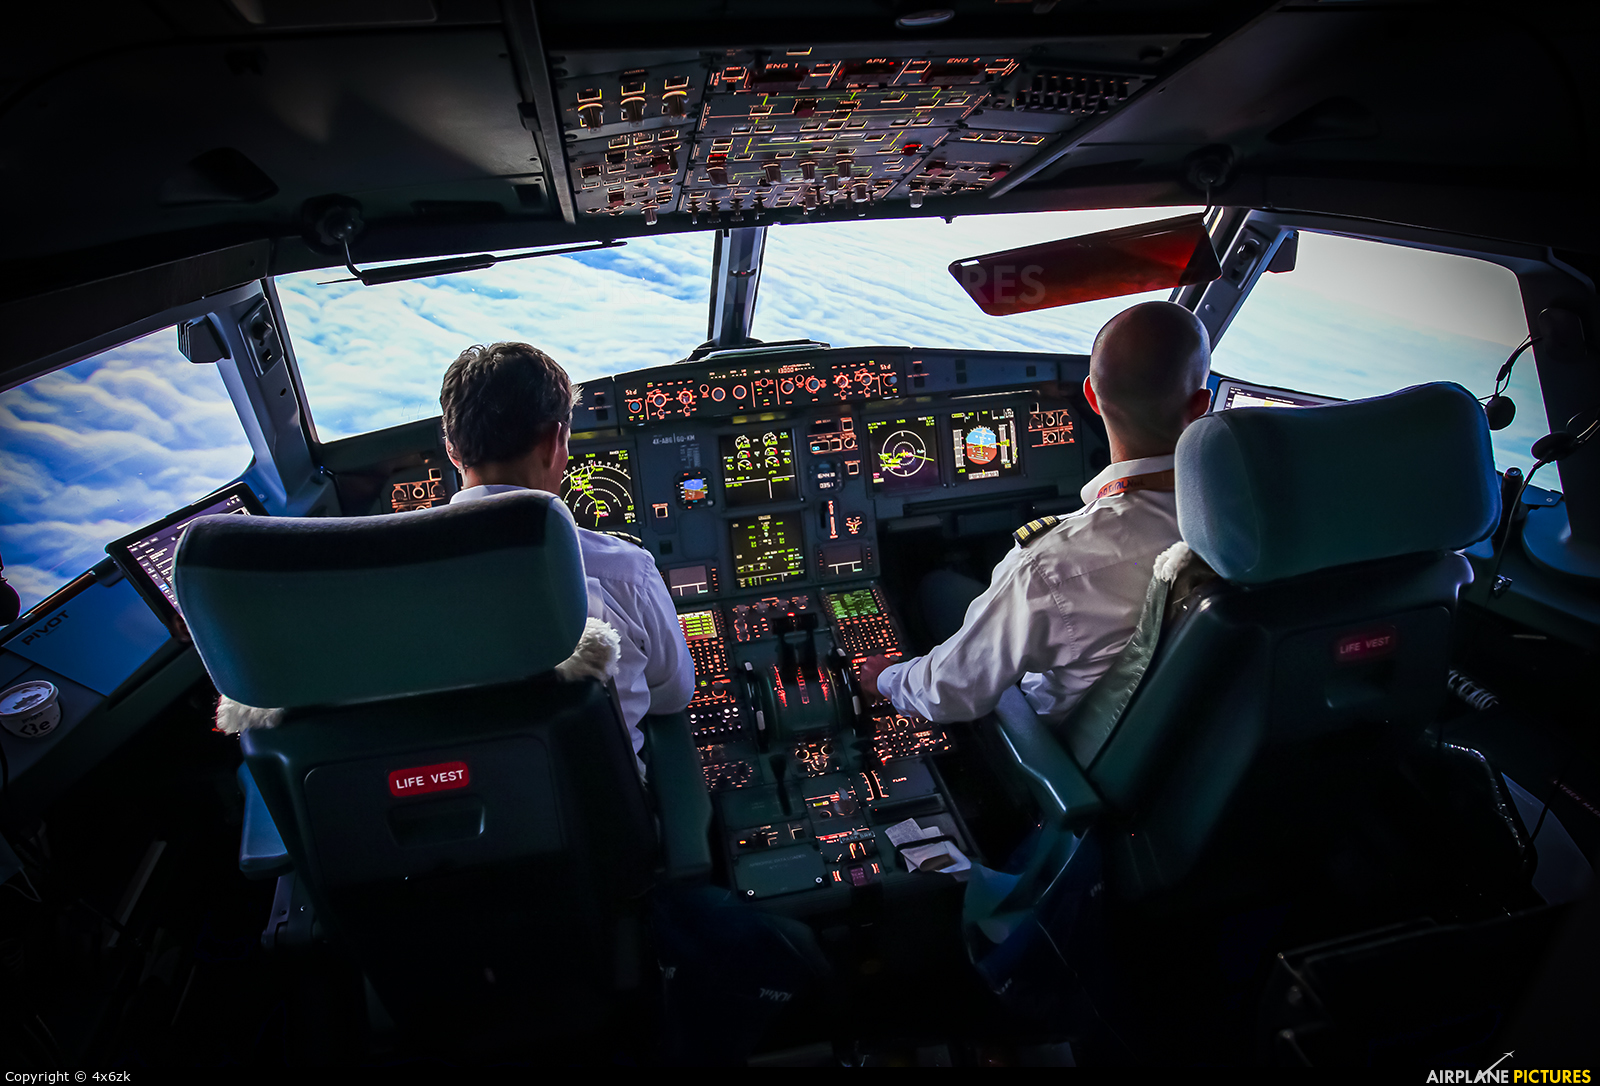 Israir Airlines 4X-ABG aircraft at In Flight - International